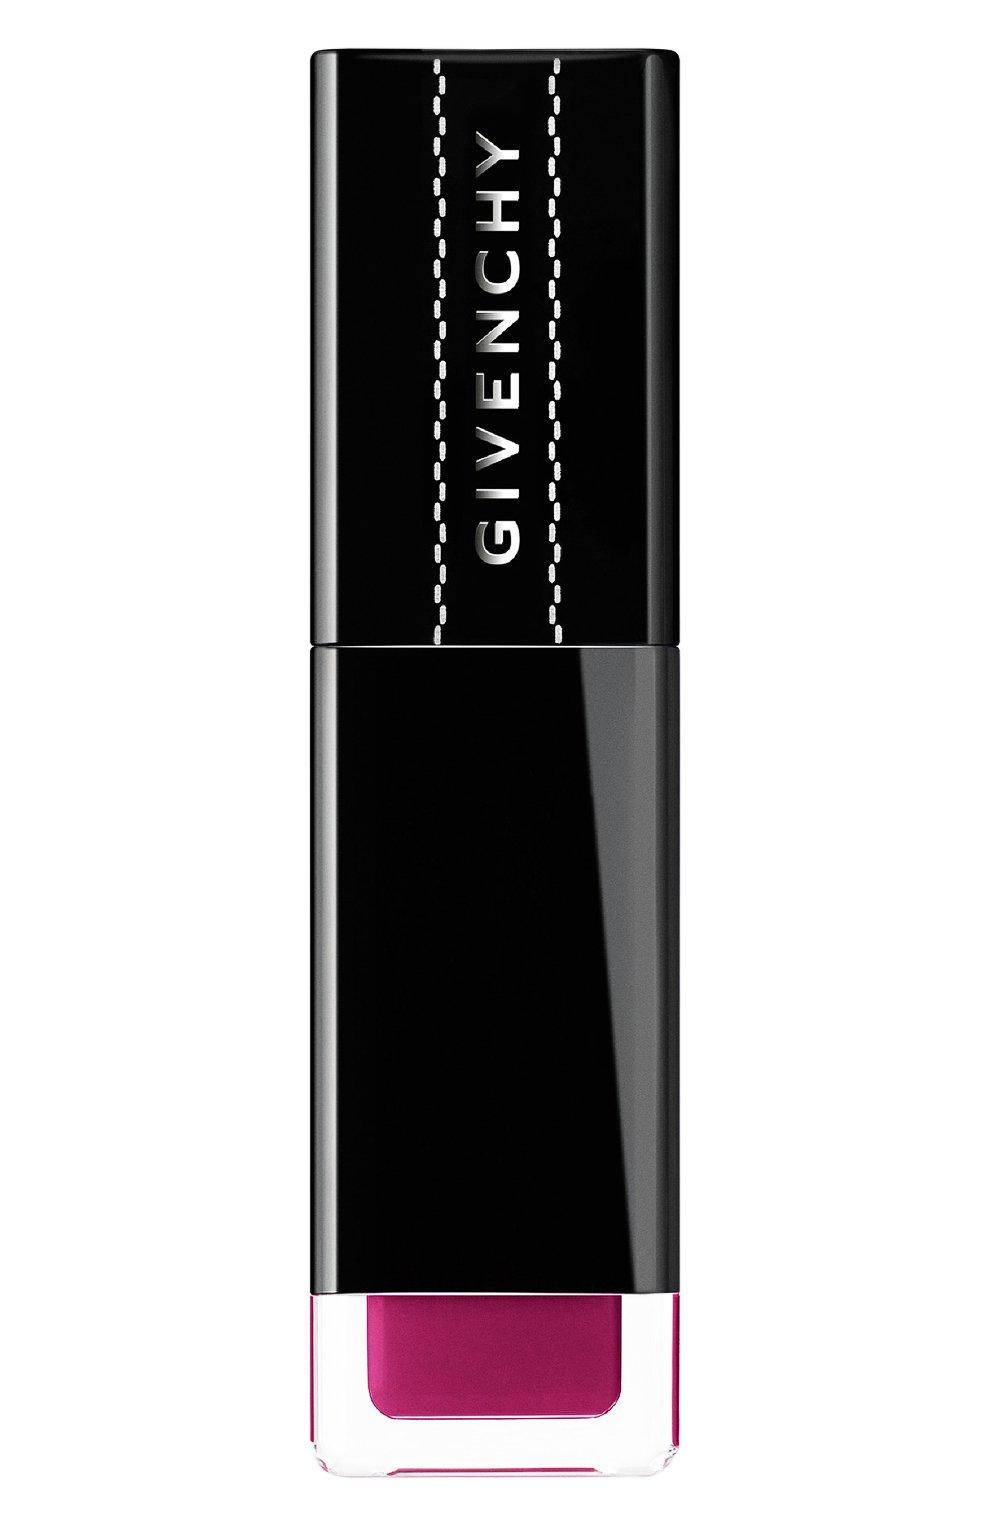 Тинт для губ Encre Interdit, оттенок 07 озорная фуксия | Фото №1